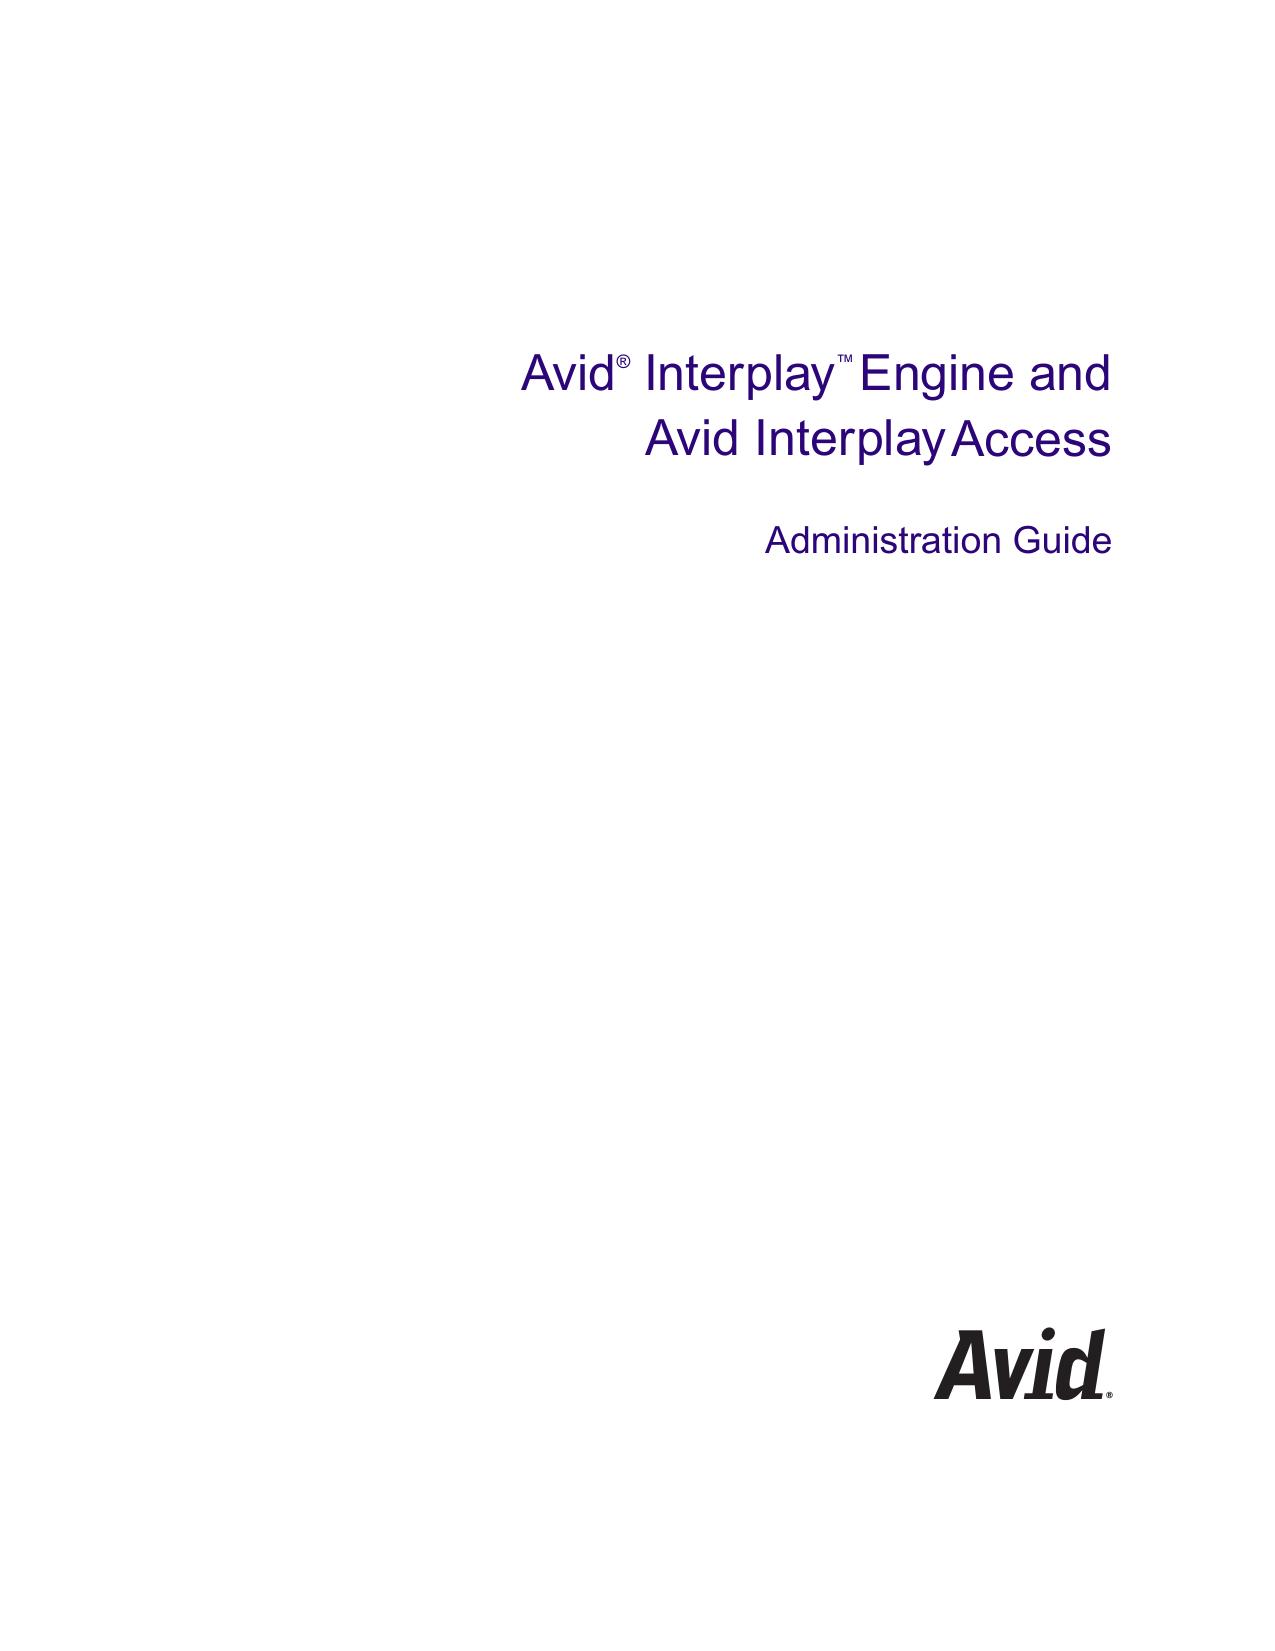 Avid Interplay Engine and Avid Interplay Access